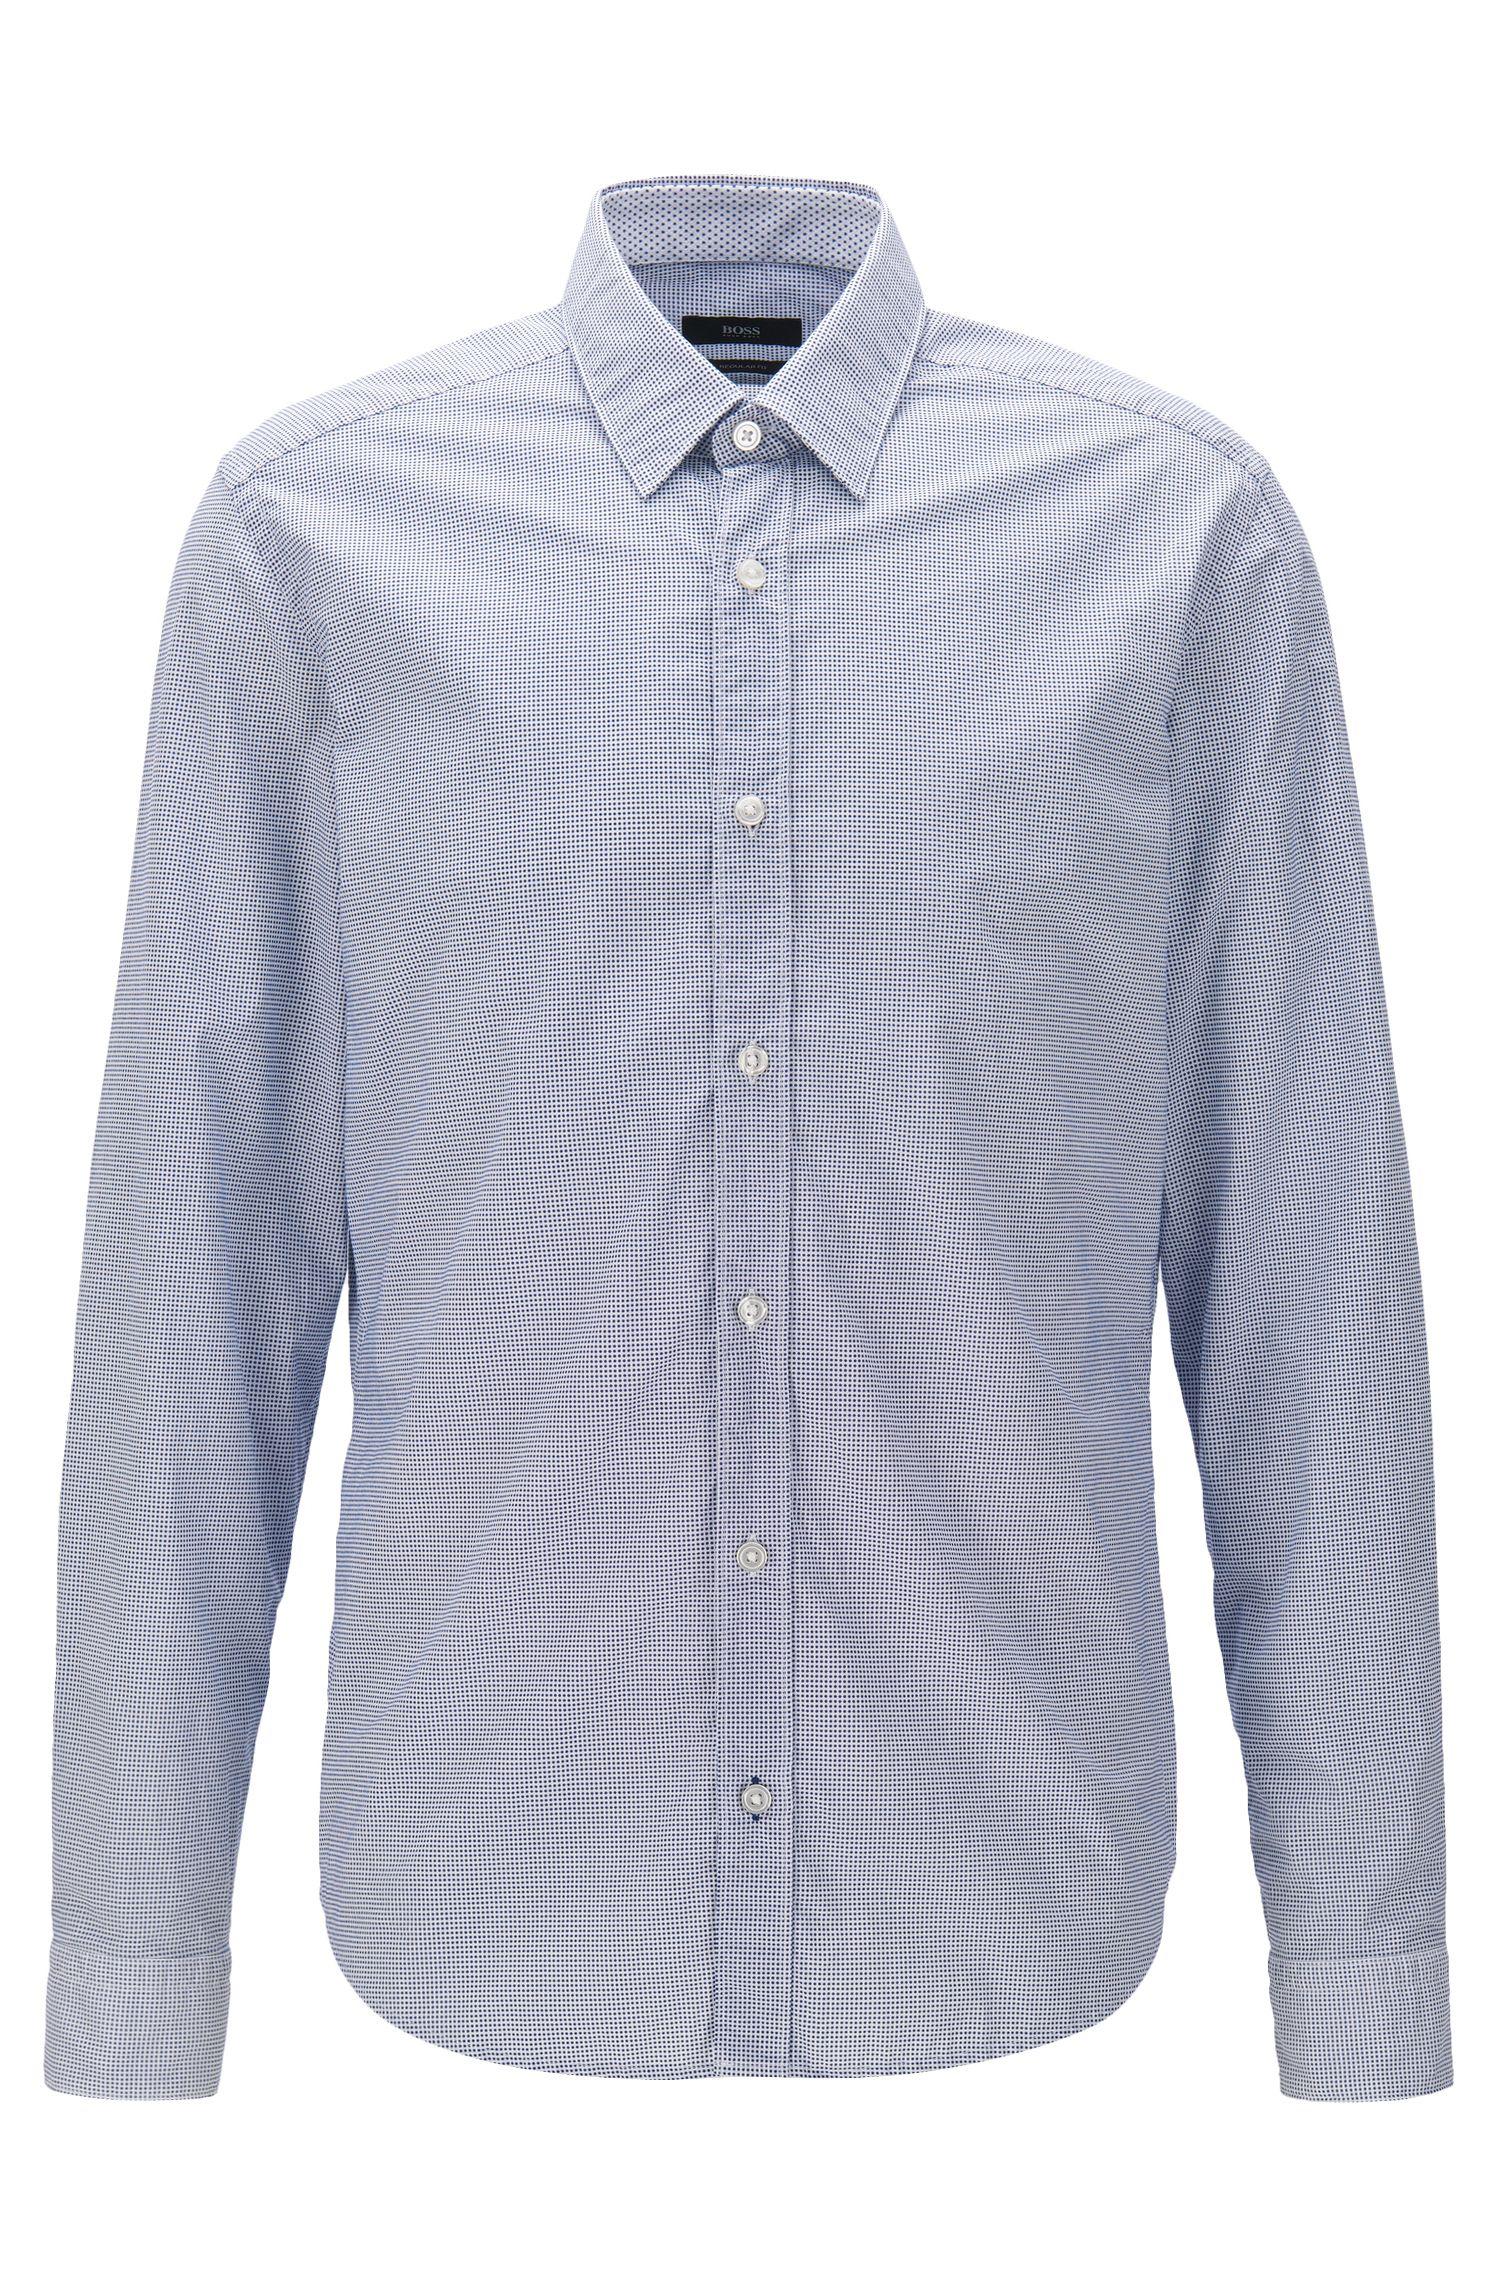 Regular-fit shirt in printed cotton poplin